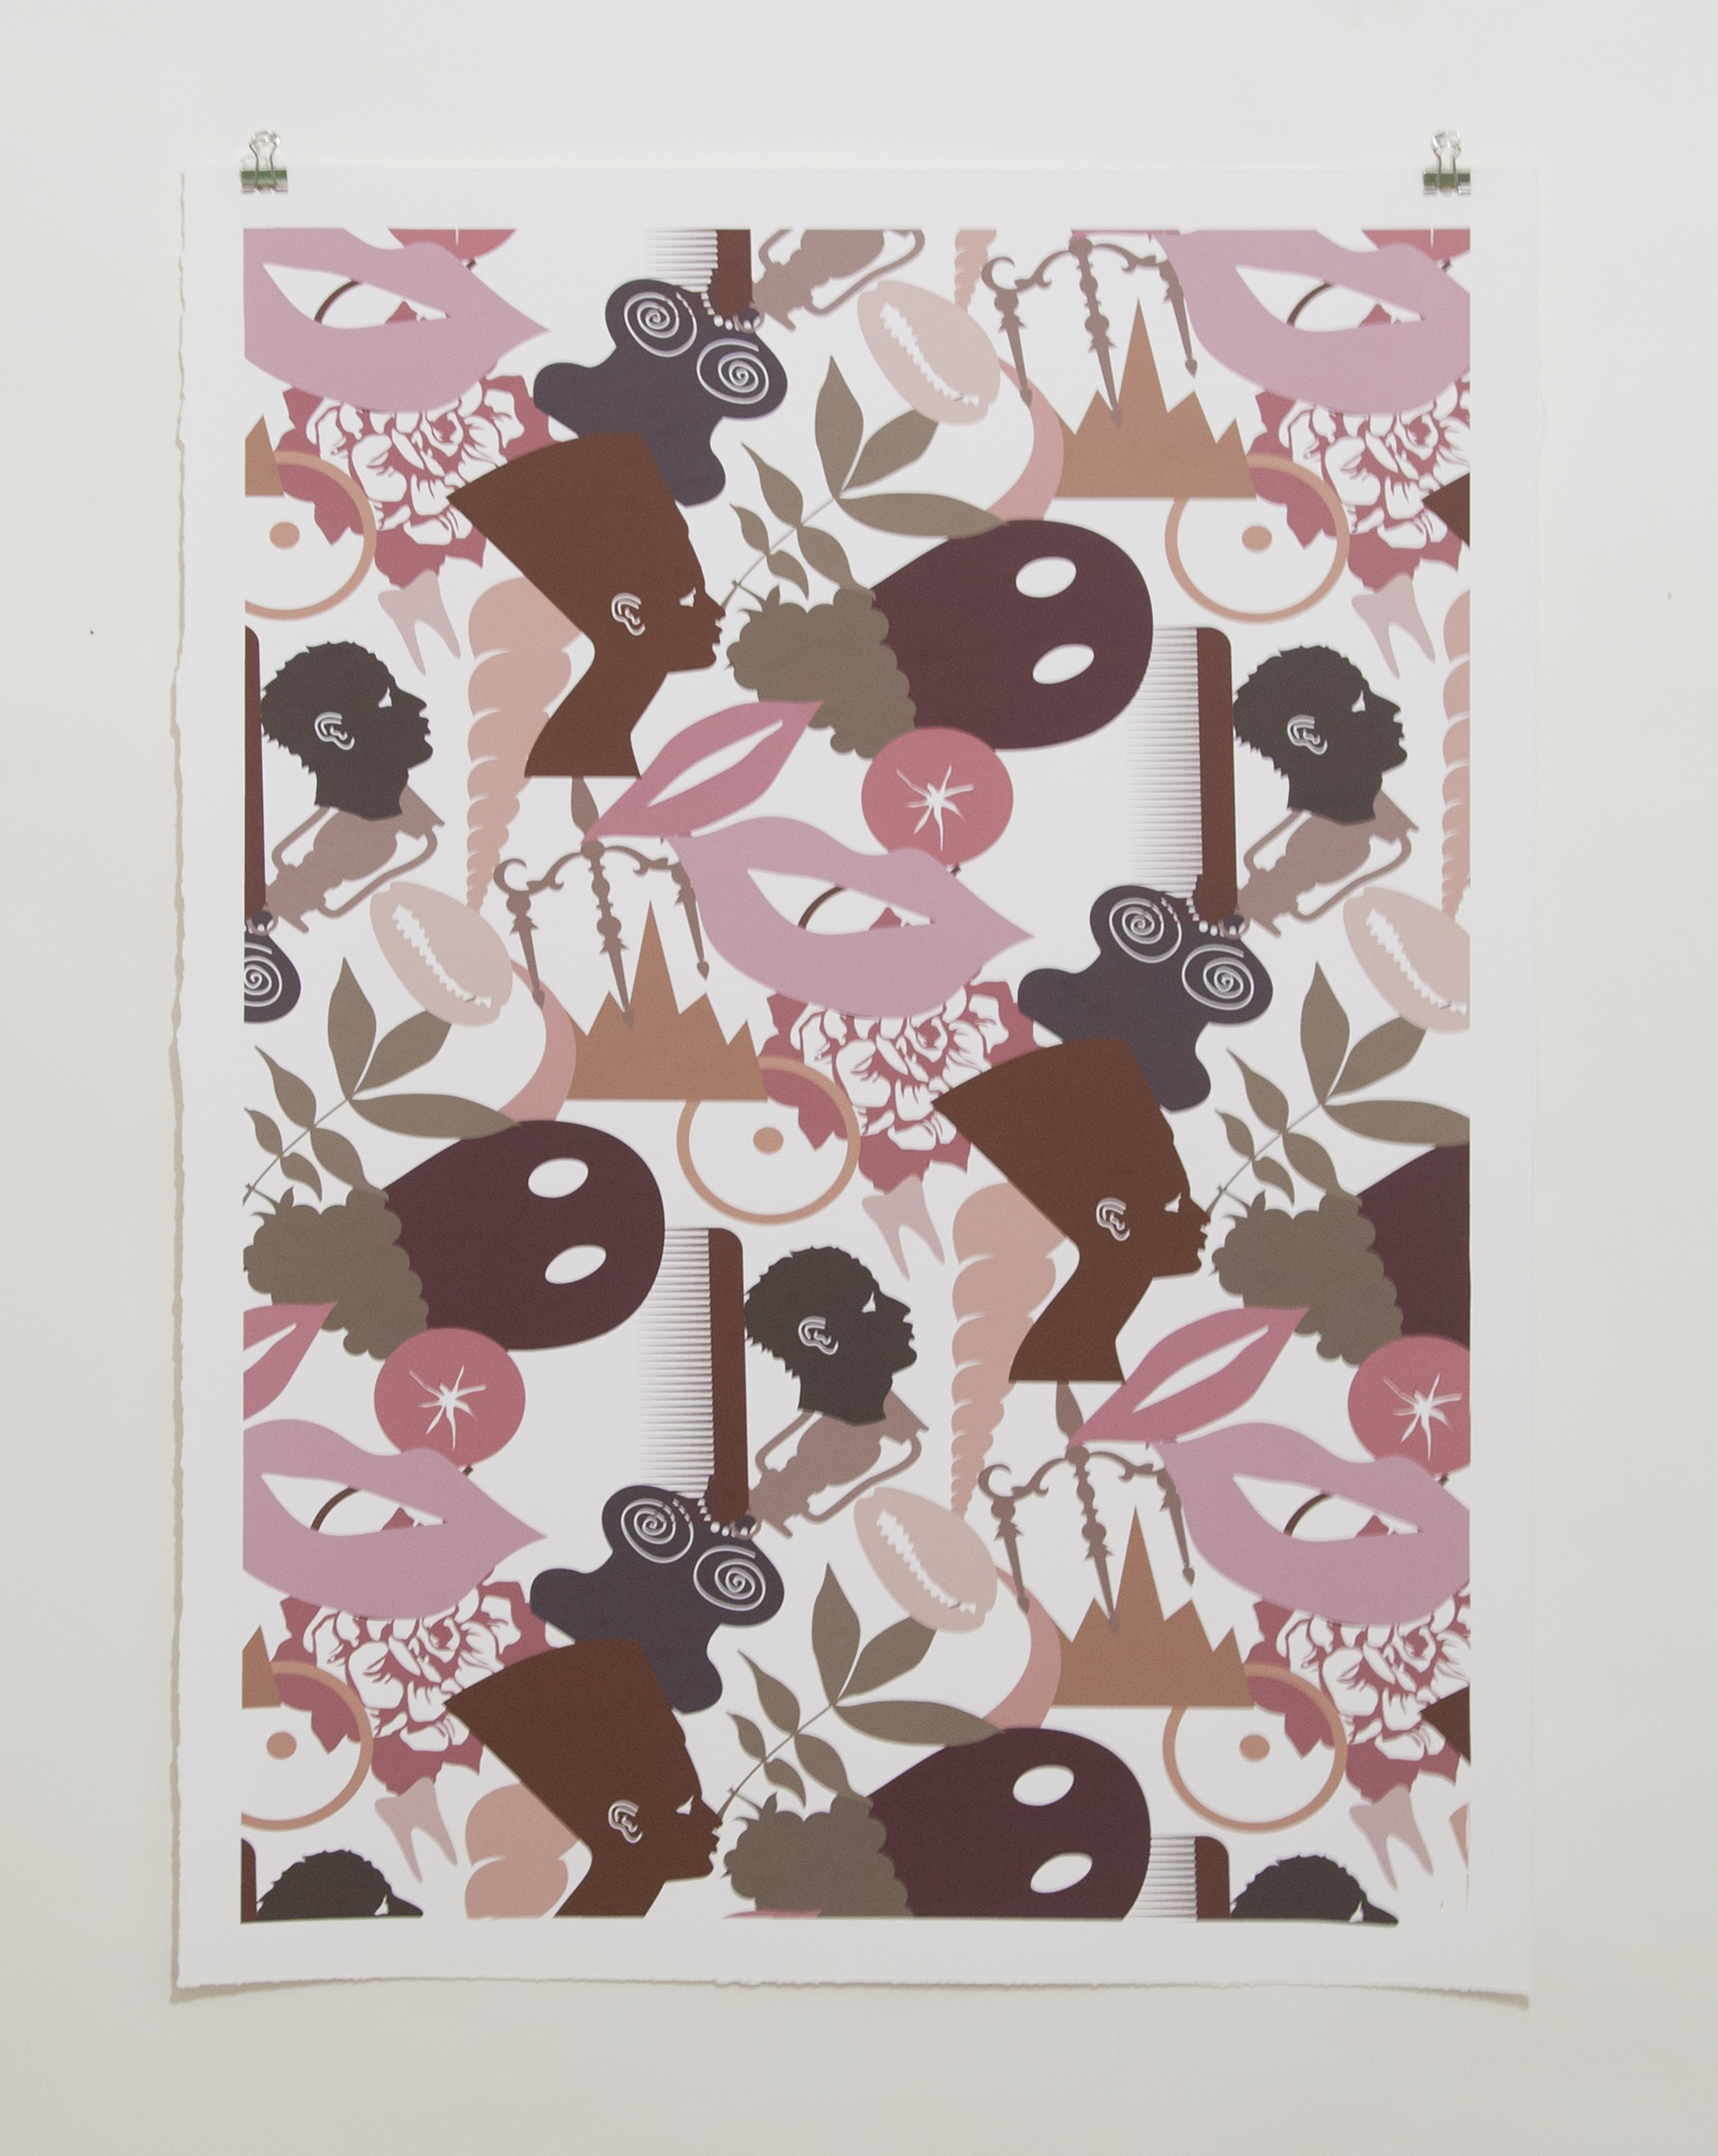 Fleshy , 2015 Digital Print on Cold Press Paper 32 x 22 inches